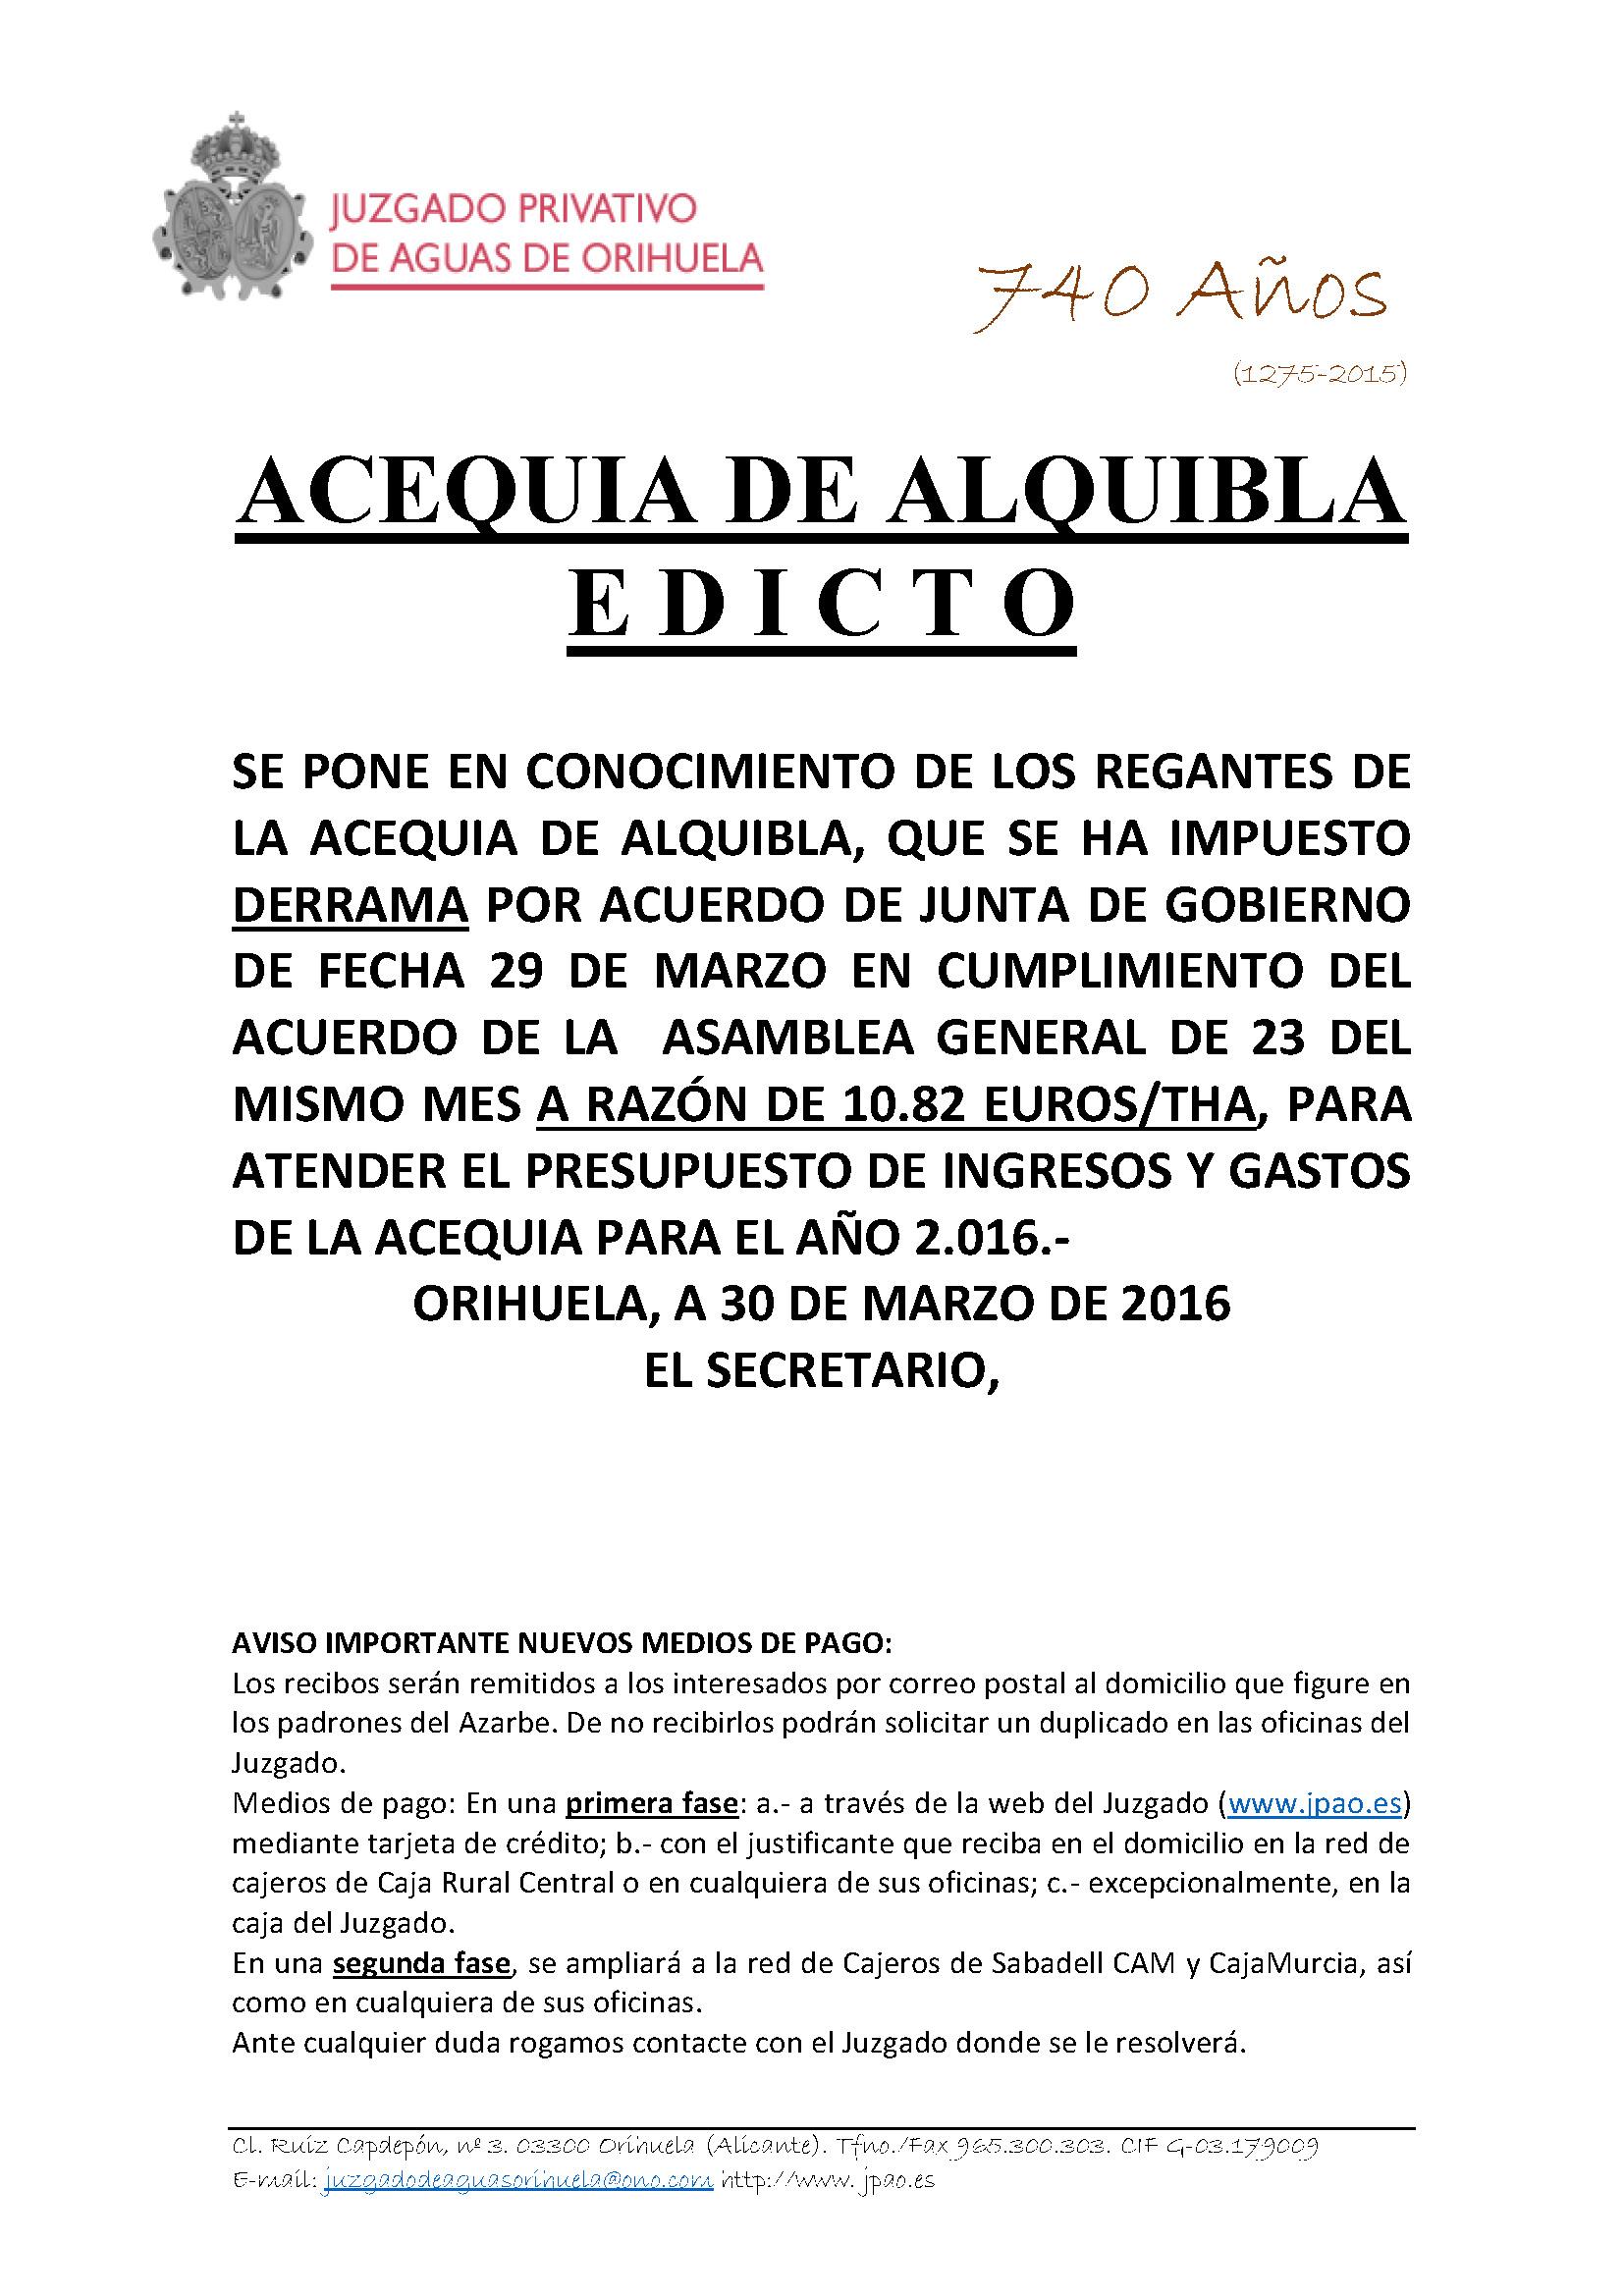 41 2016 ACEQUIA ALQUIBLA. EDICTO IMPOSICION DERRAMA